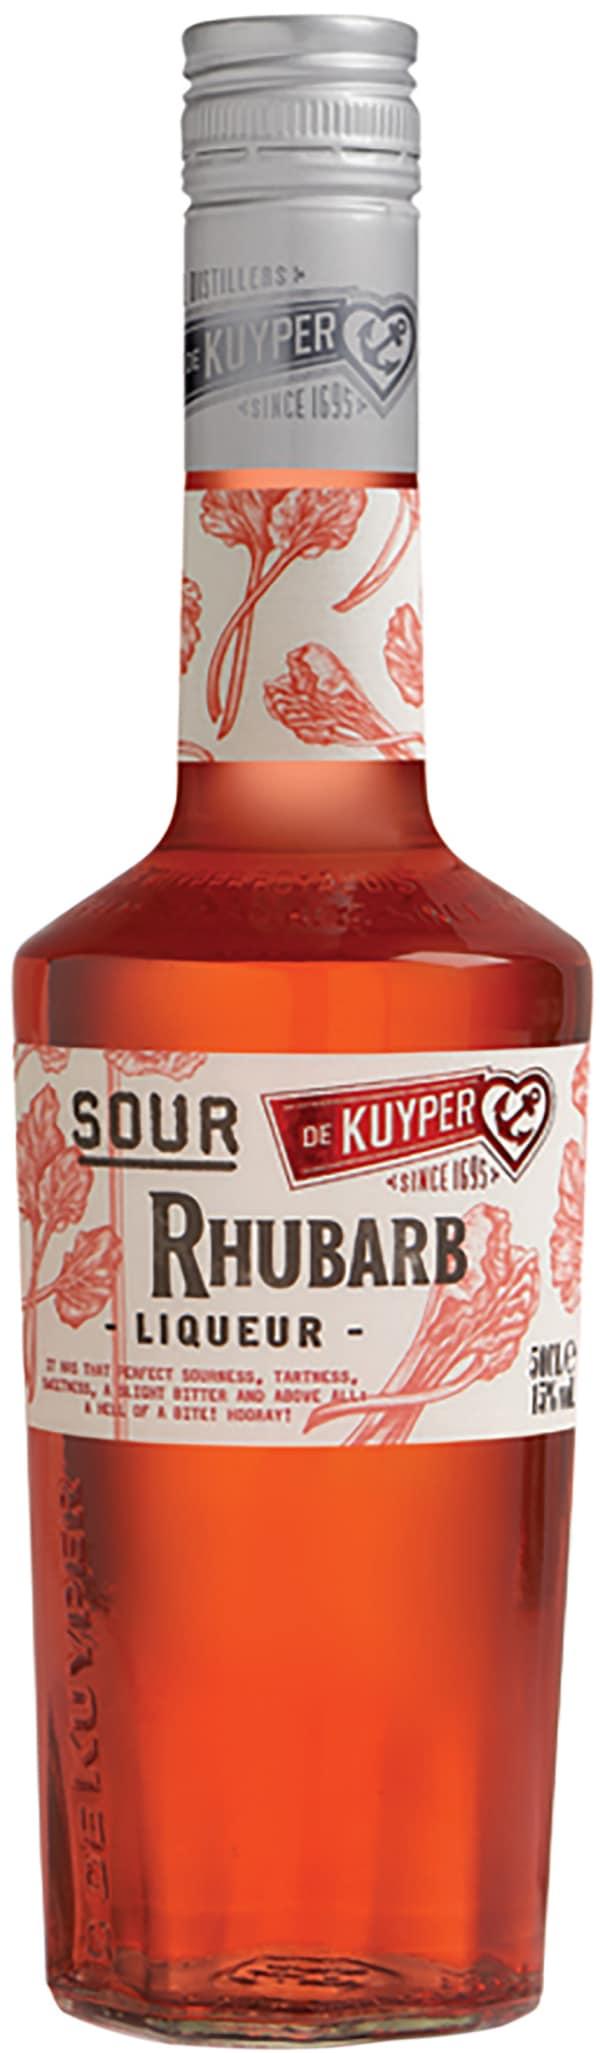 De Kuyper Sour Rhubarb